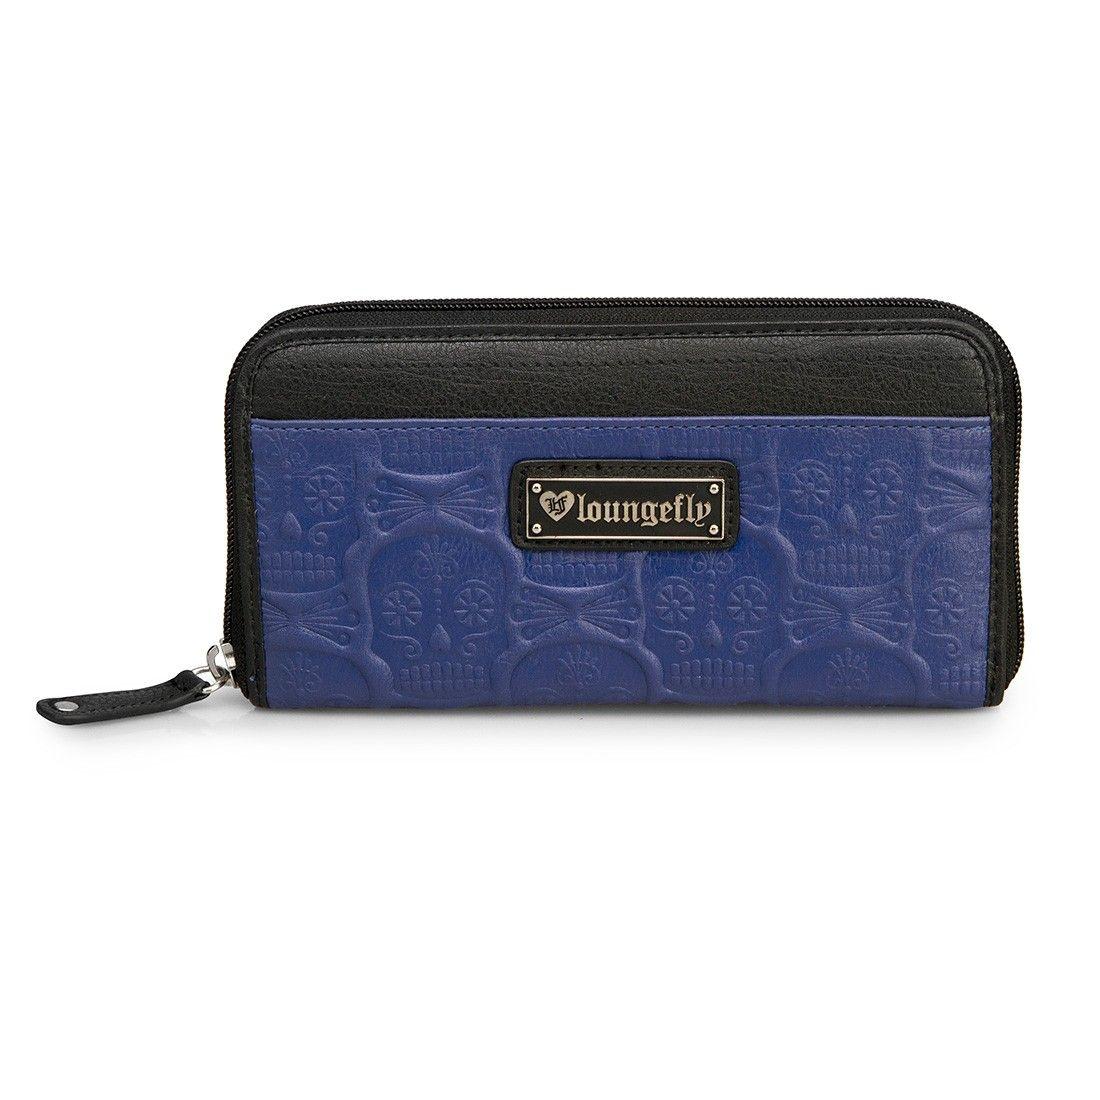 Loungefly Sugar Skull Blue/Black Embossed Wallet